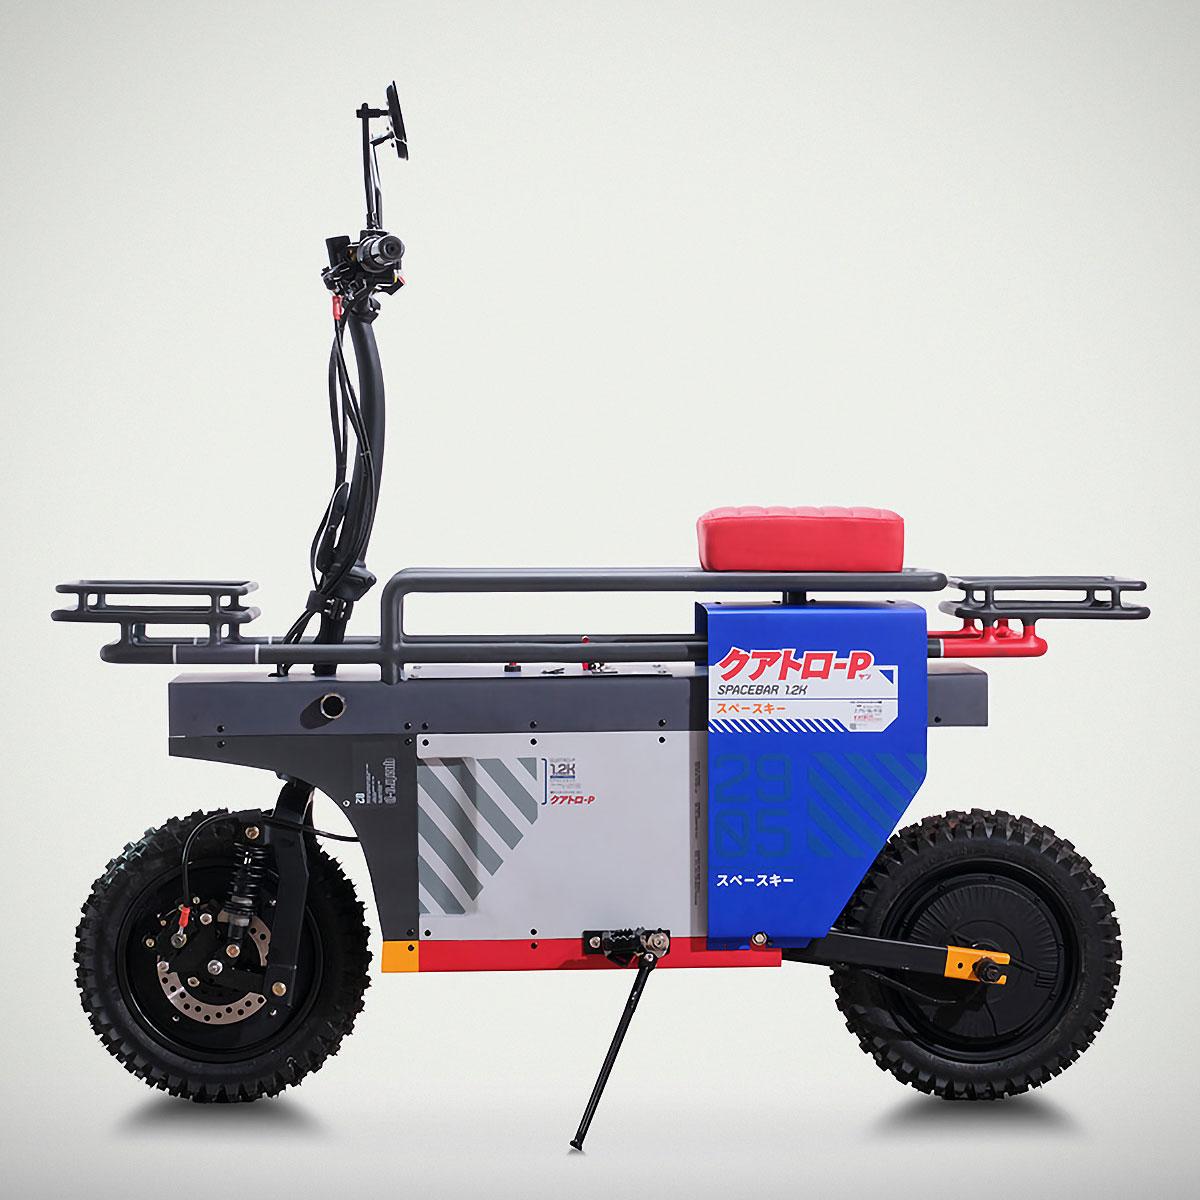 Katalis Spacebar 1.2K Electric Scooter